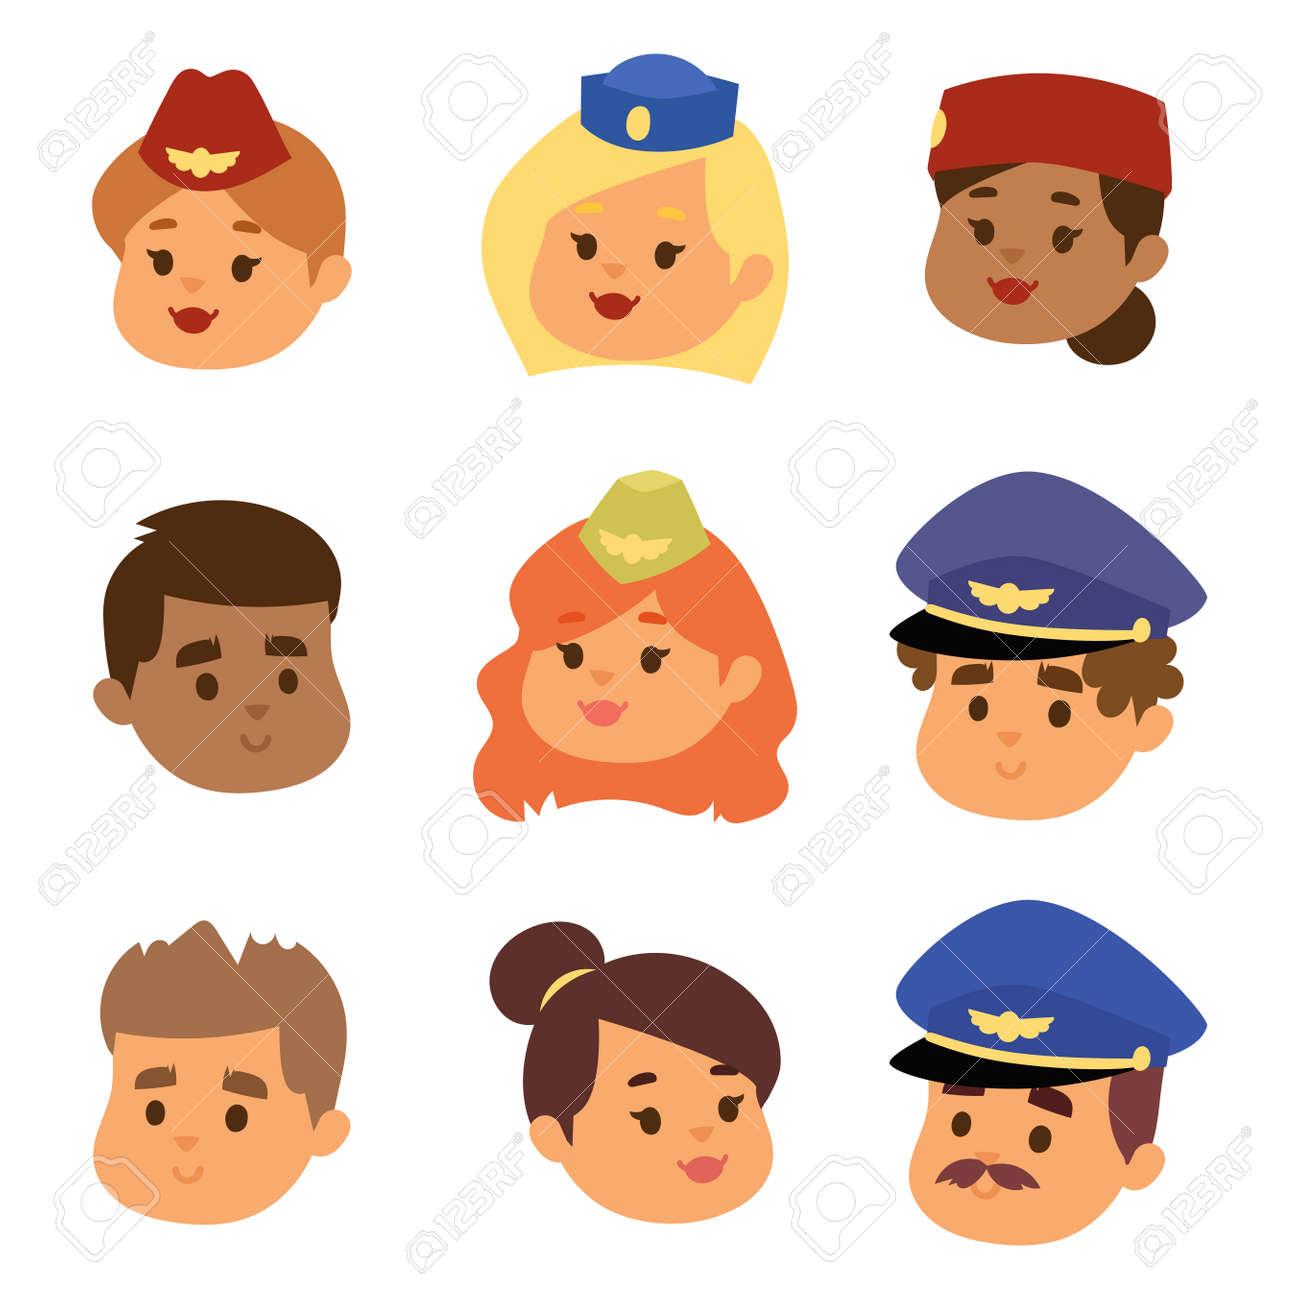 Pilots and stewardess vector head illustration. - 97797966